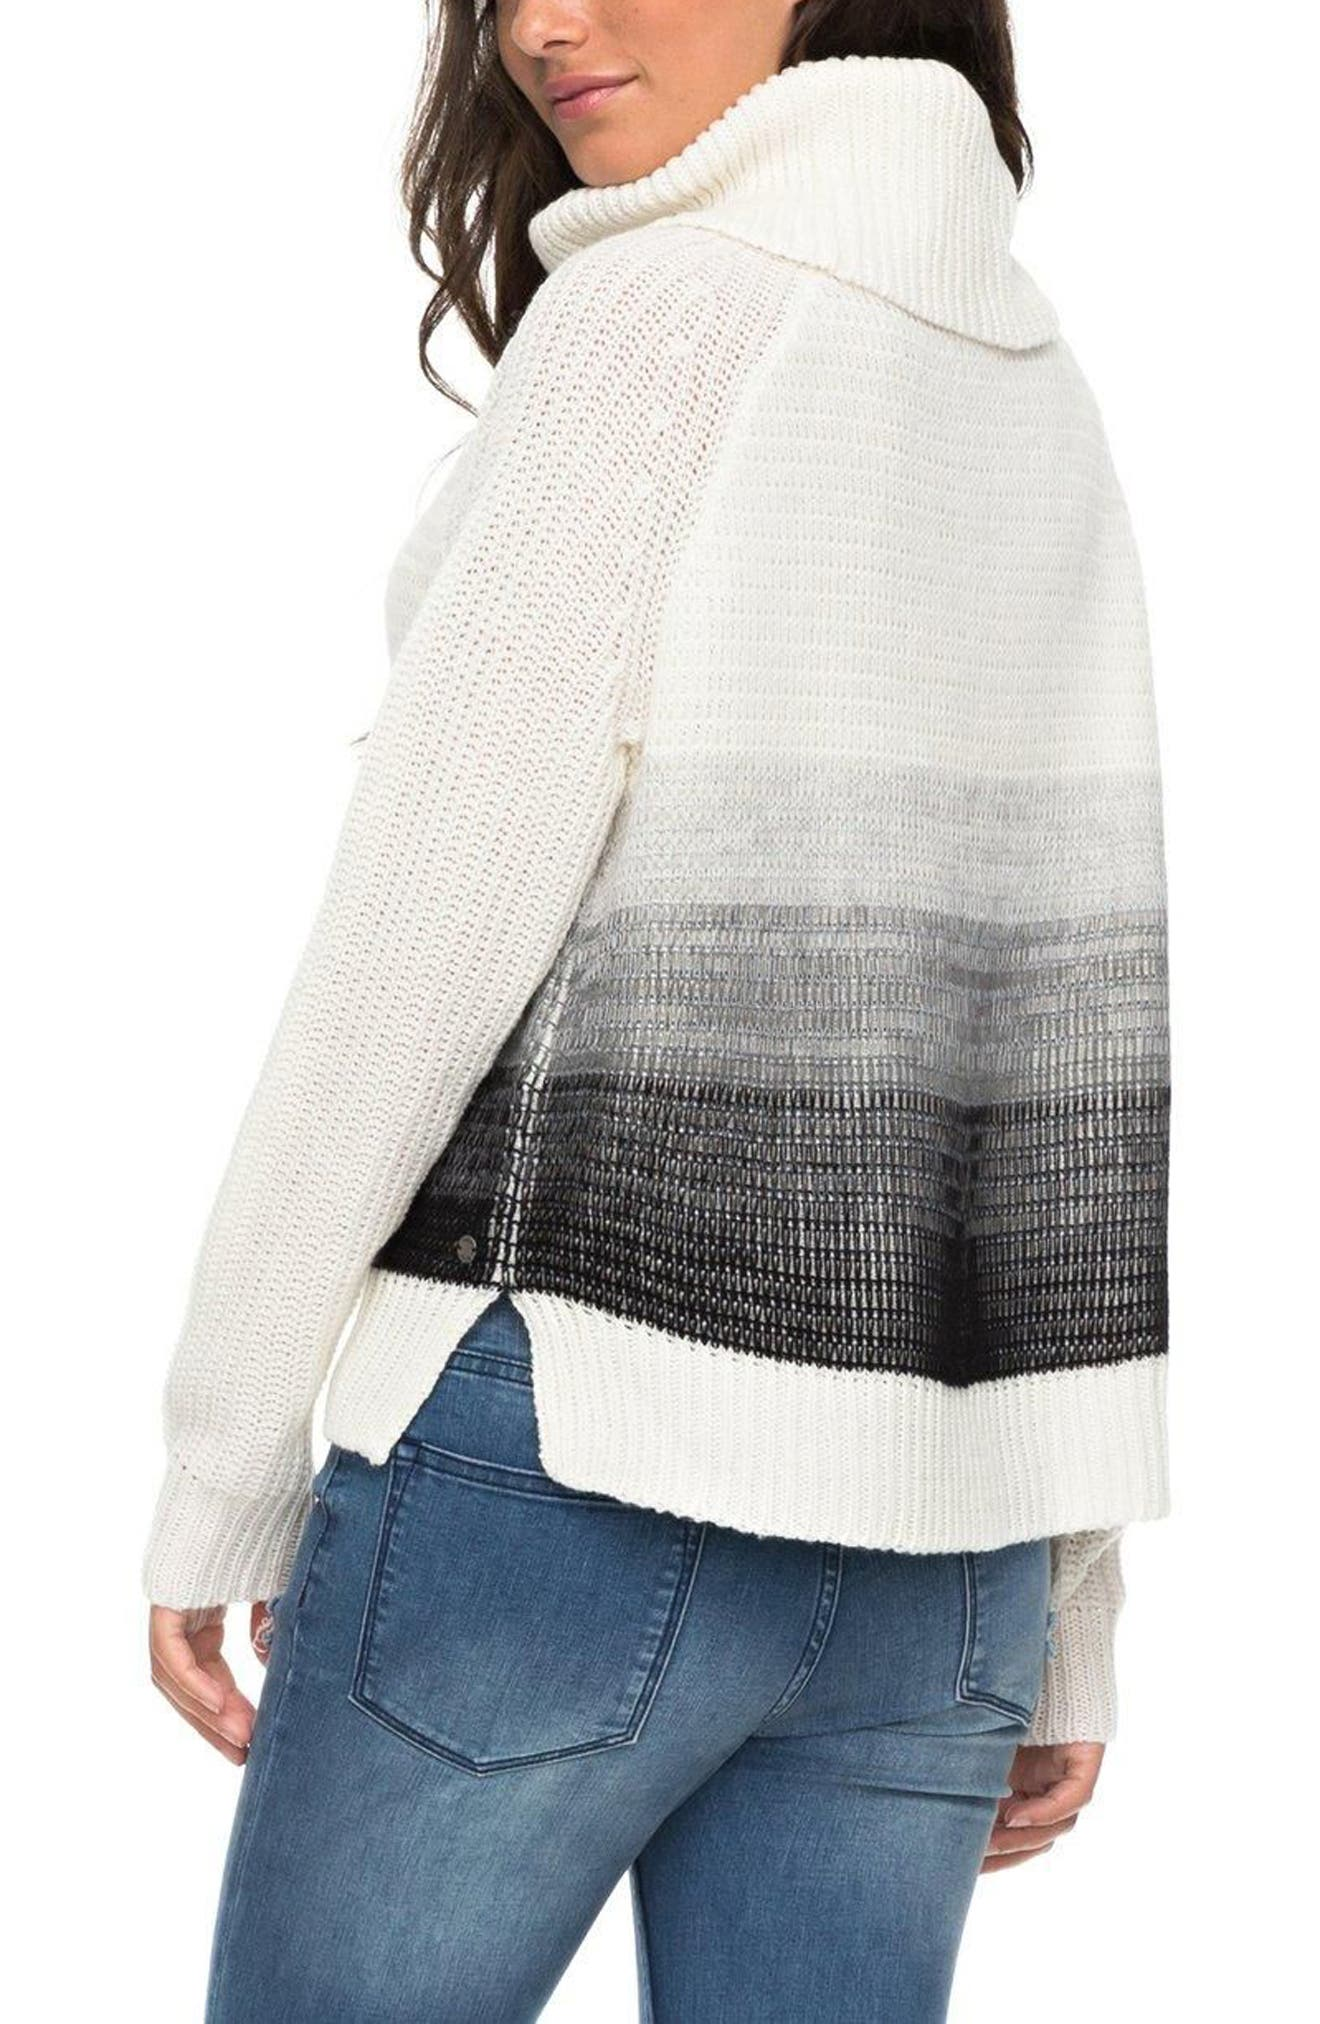 Morning Sun Sweater,                             Alternate thumbnail 2, color,                             101